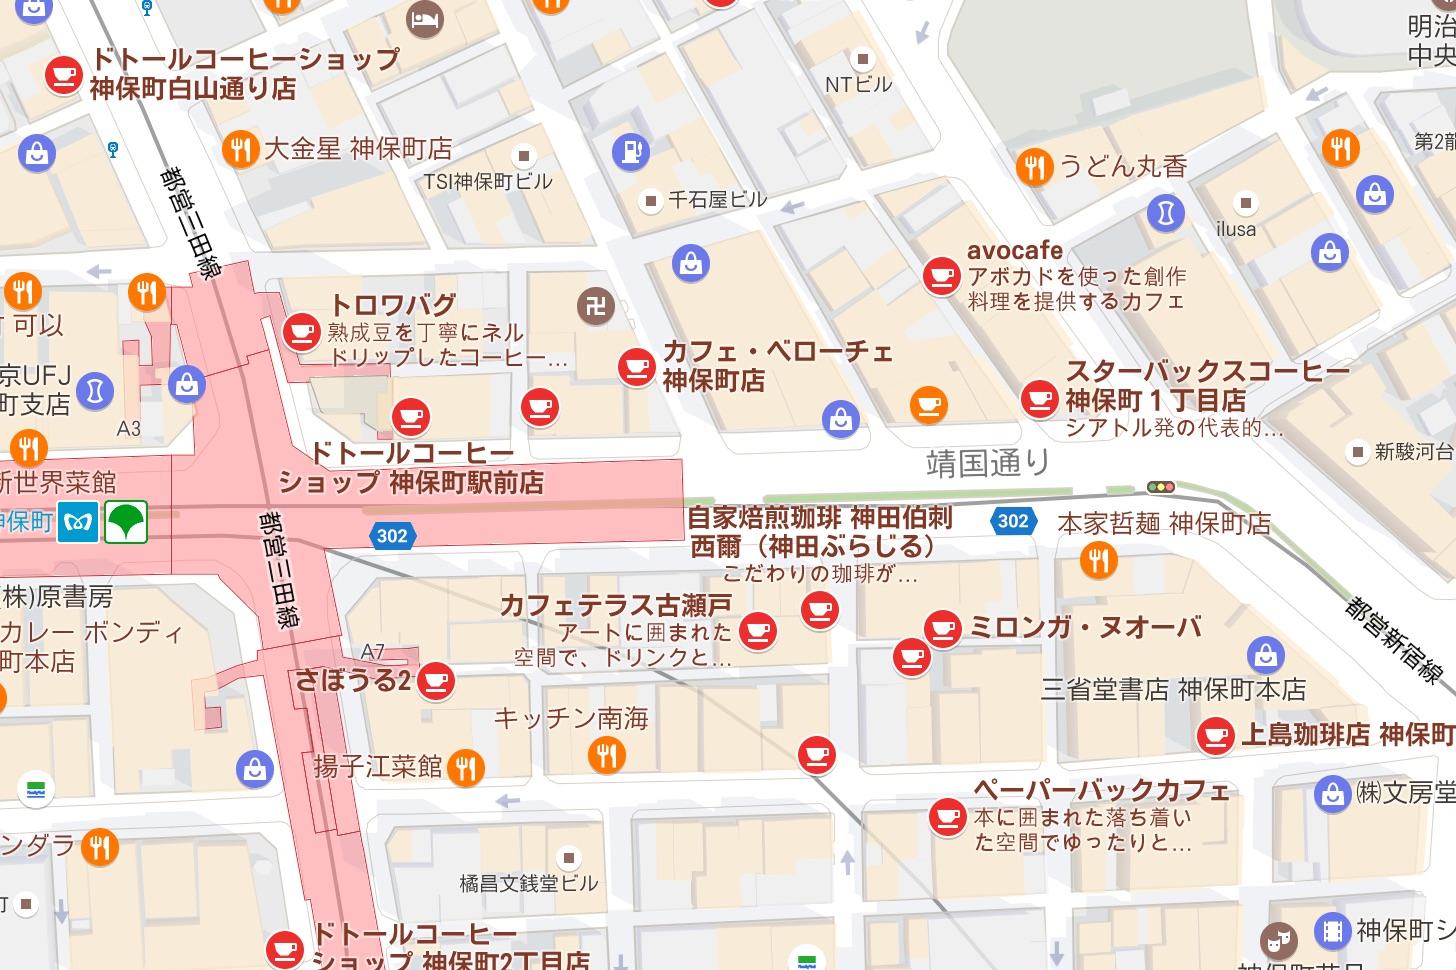 CAFE MAP 〜東京カフェマップ〜 トップ画像